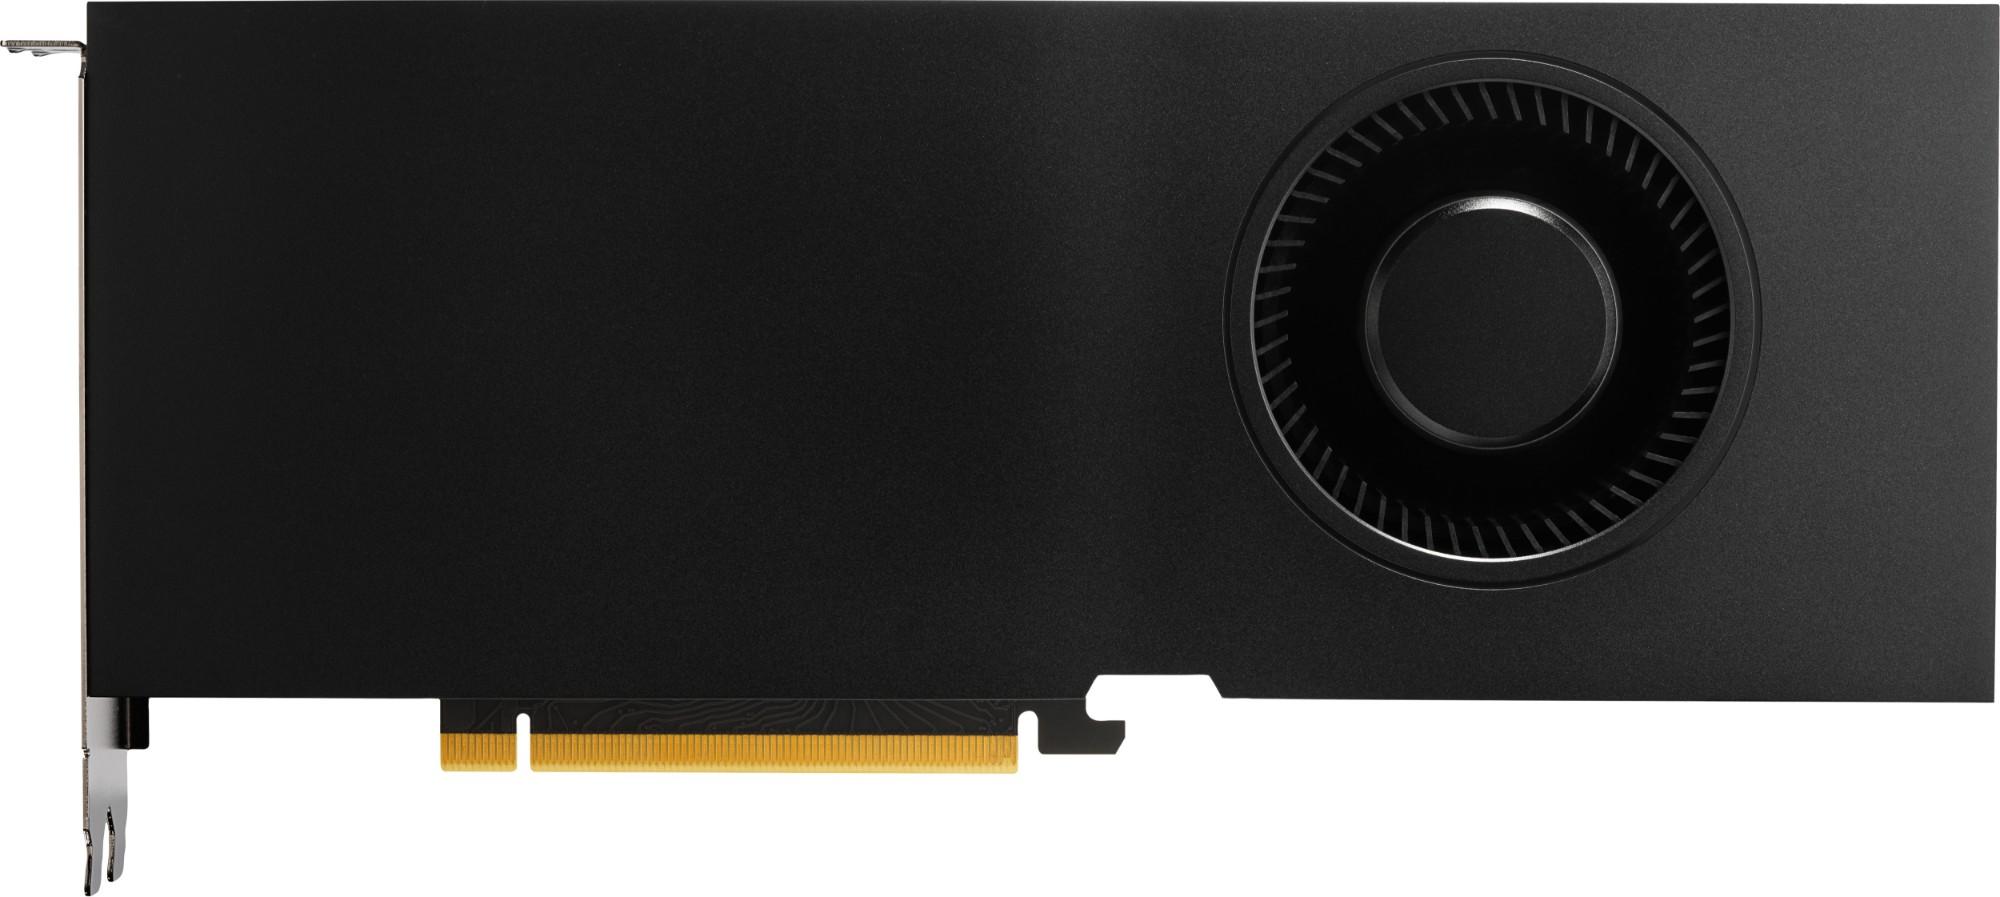 HP NVIDIA RTX A5000 24 GB 4DP Graphics